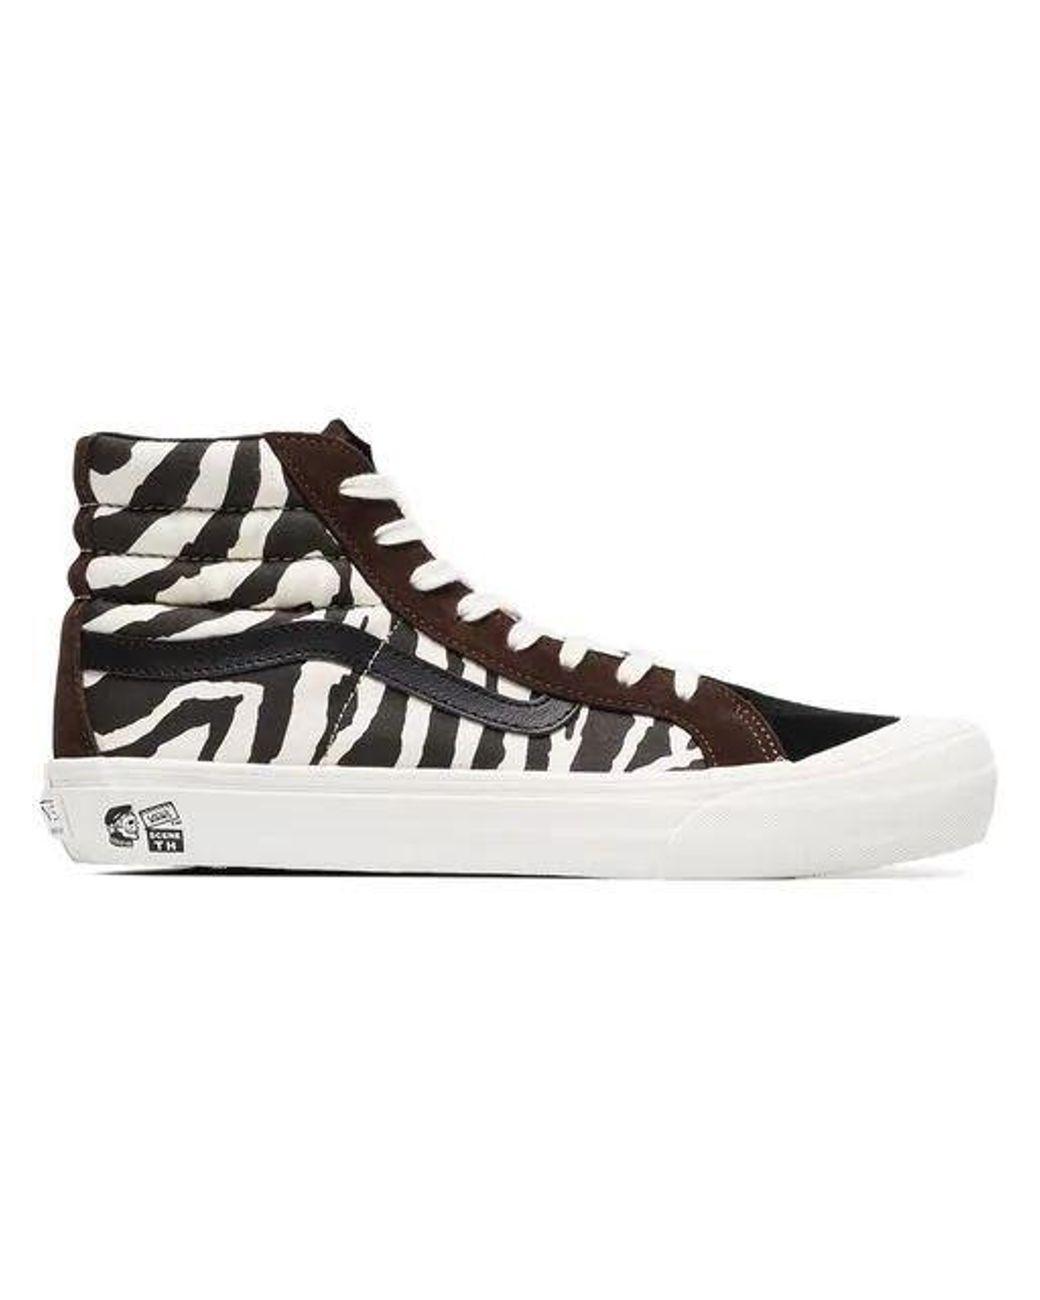 daac42d782 Vans Brown And White Vault X Taka Hayashi Zebra Print Sneakers in ...